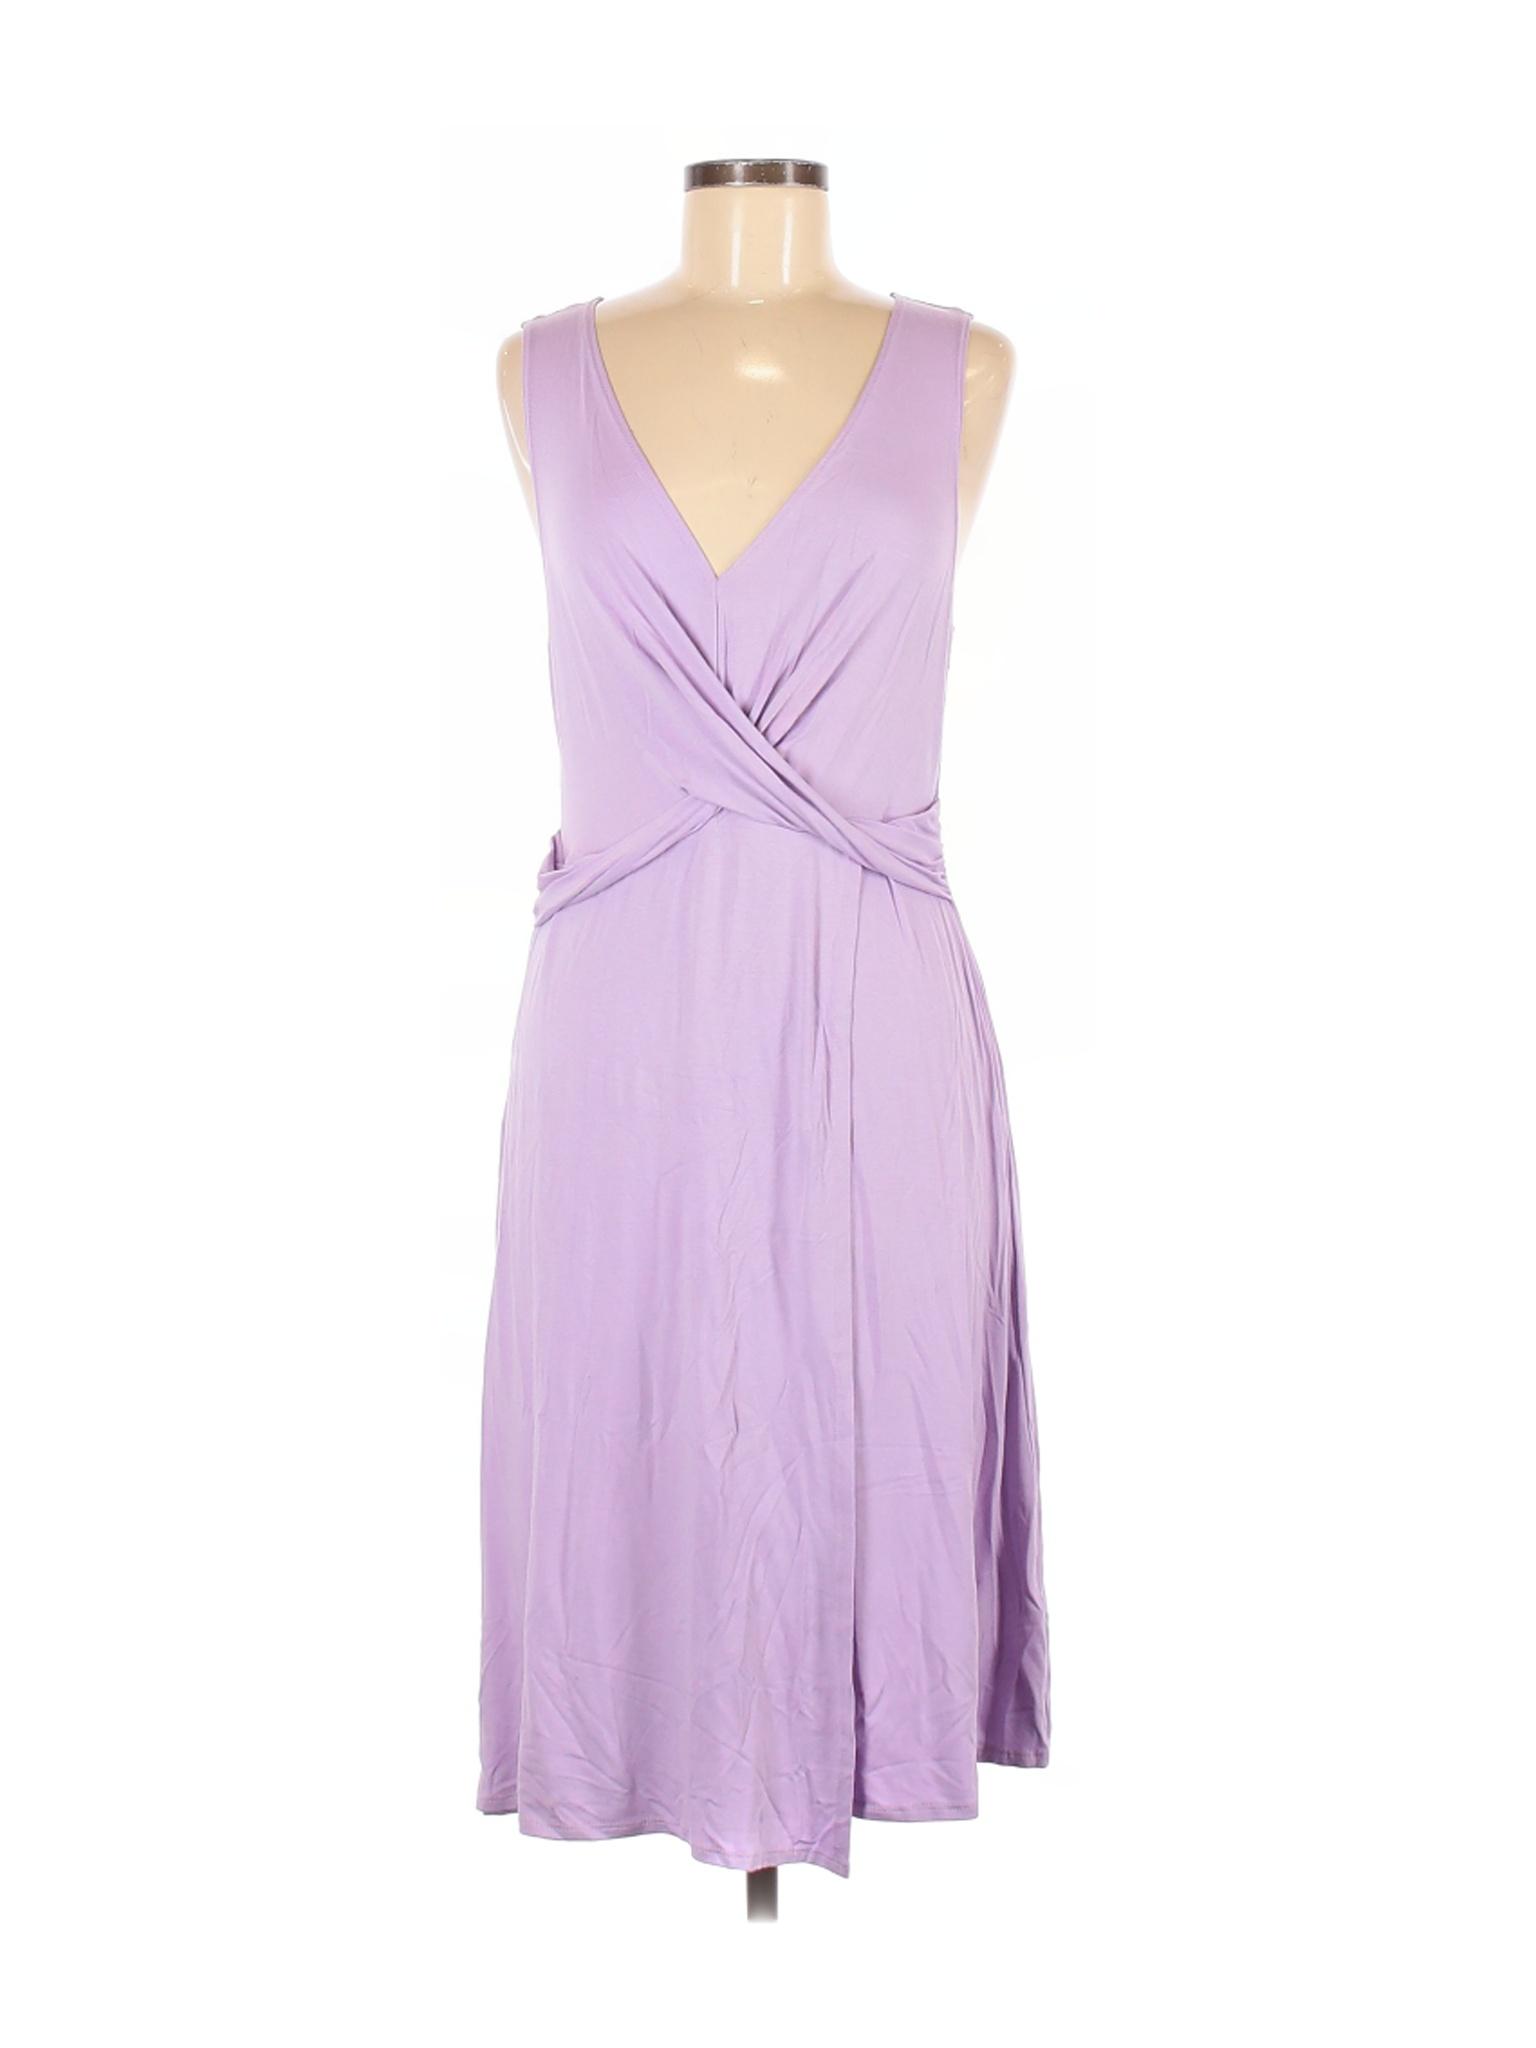 O Quarto Vanity Feminino Vestido Casual Roxo M Ebay